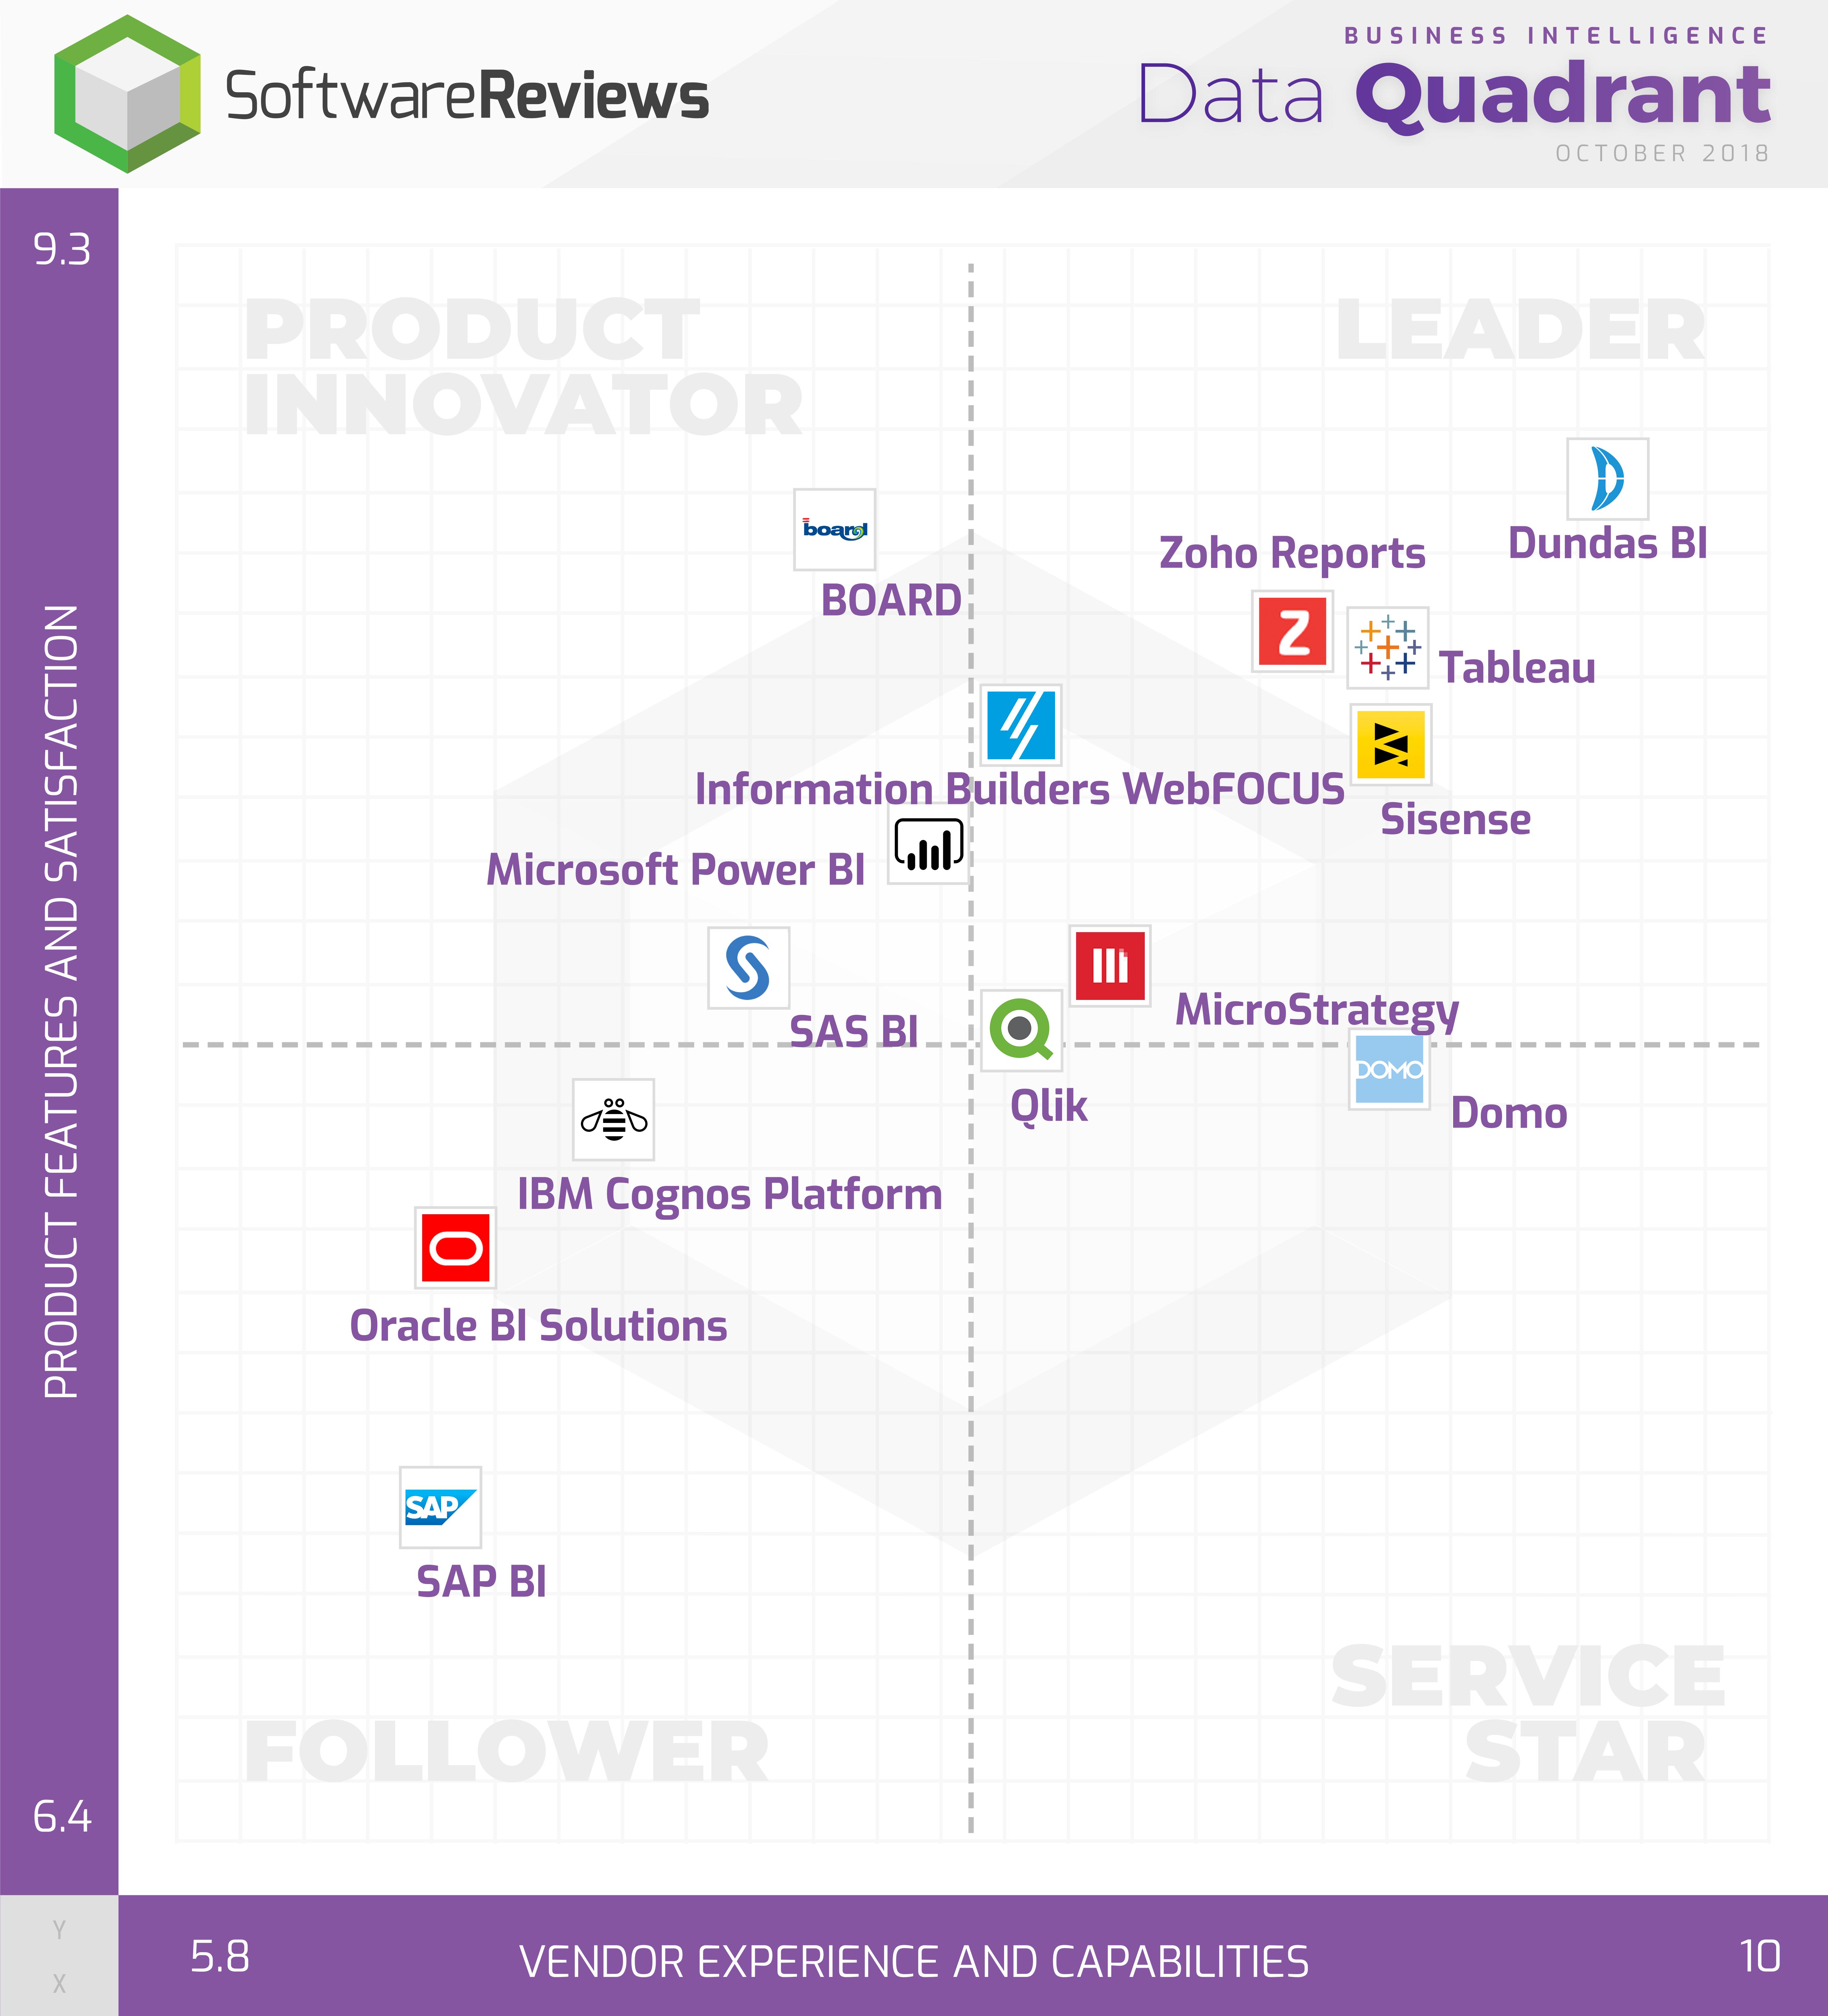 Business Intelligence Data Quadrant